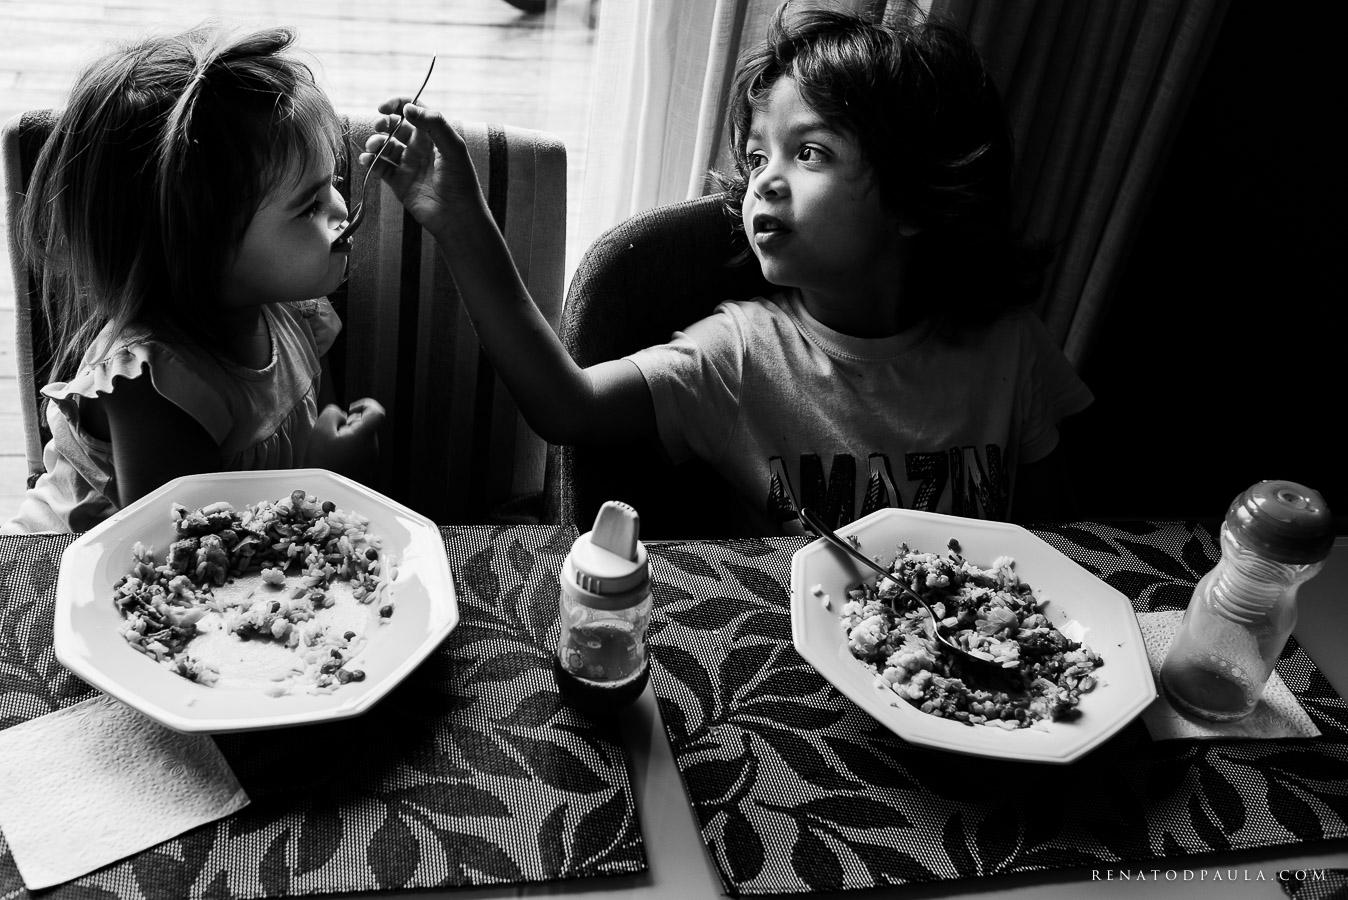 renato-dpaula-fotografia-de-familia-documental-16